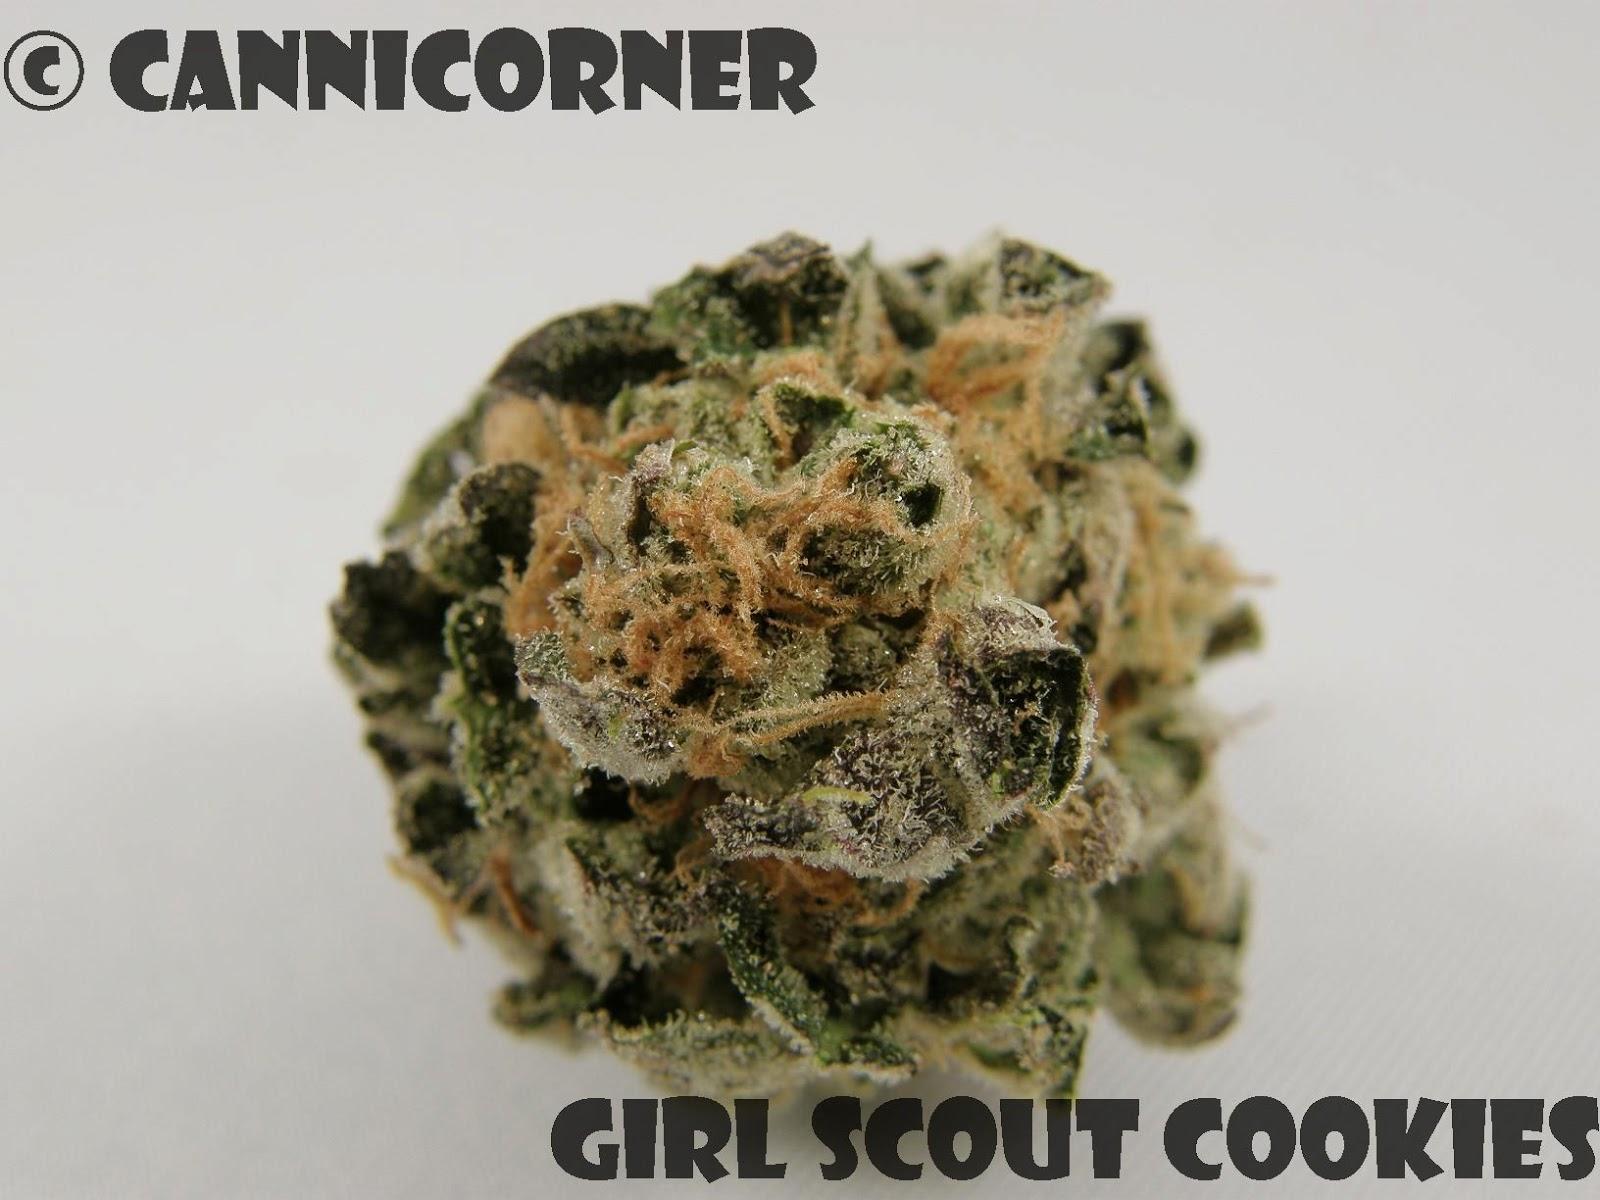 cannicorner girl scout cookies og kush x durban poison x